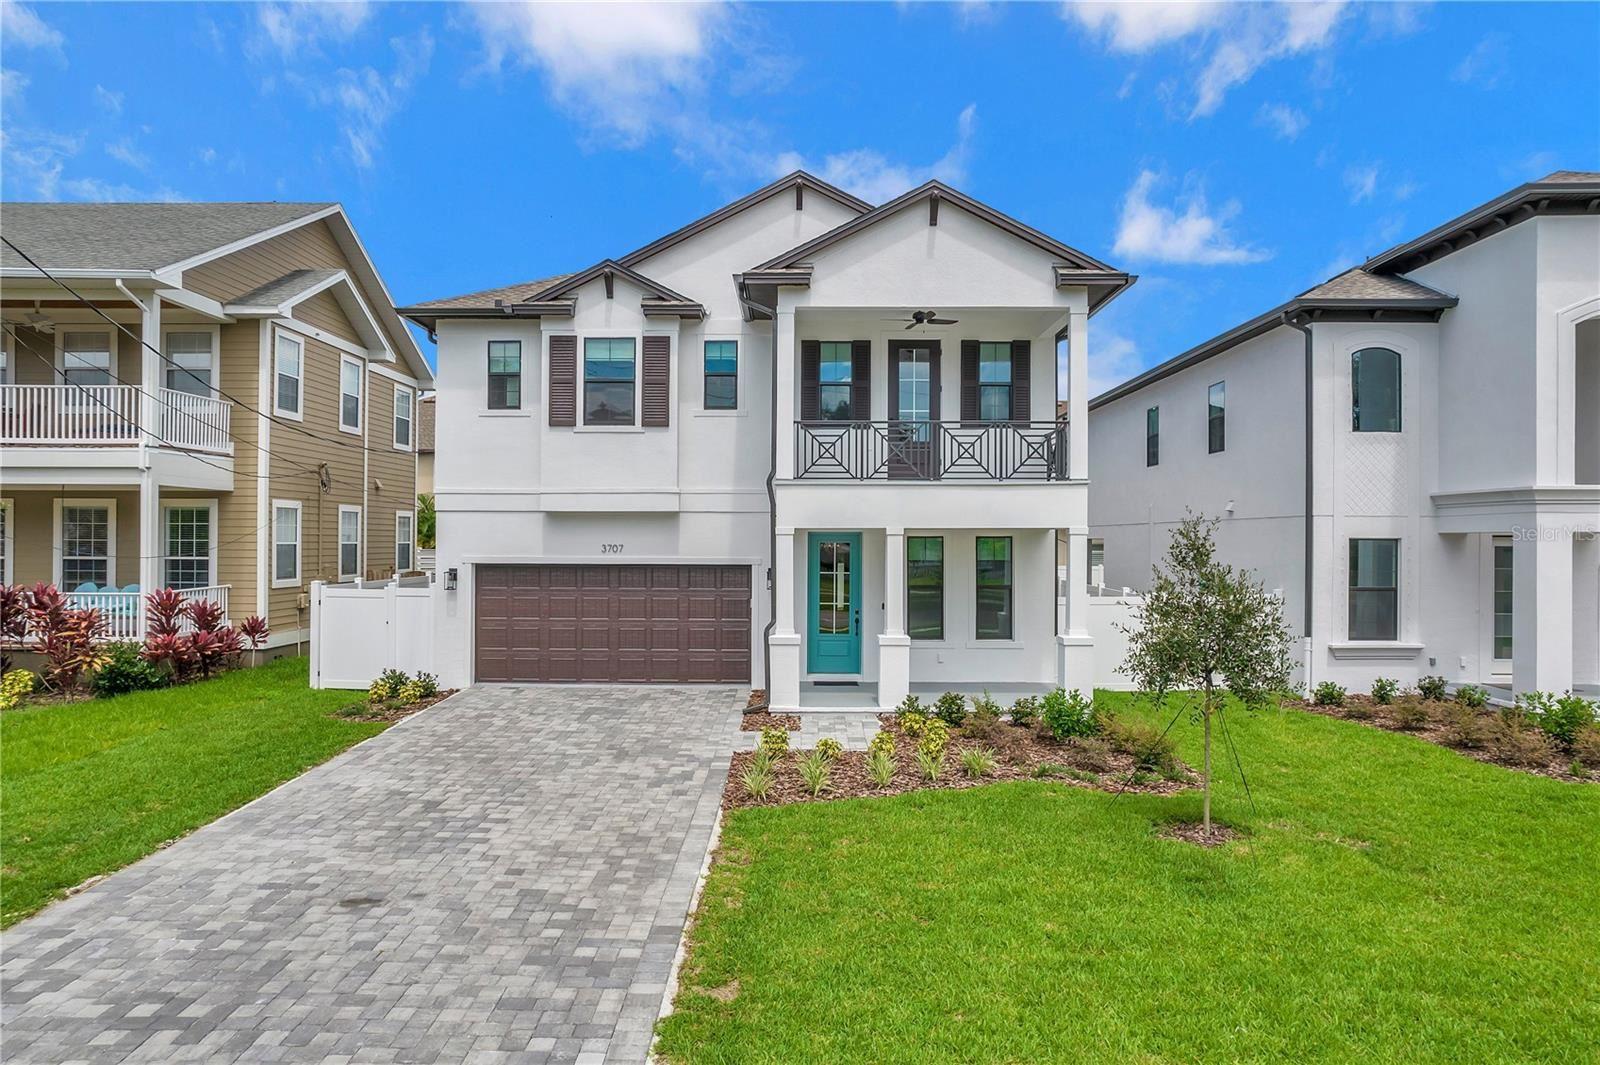 3707 W EL PRADO BOULEVARD, Tampa, FL 33629 - #: T3329561